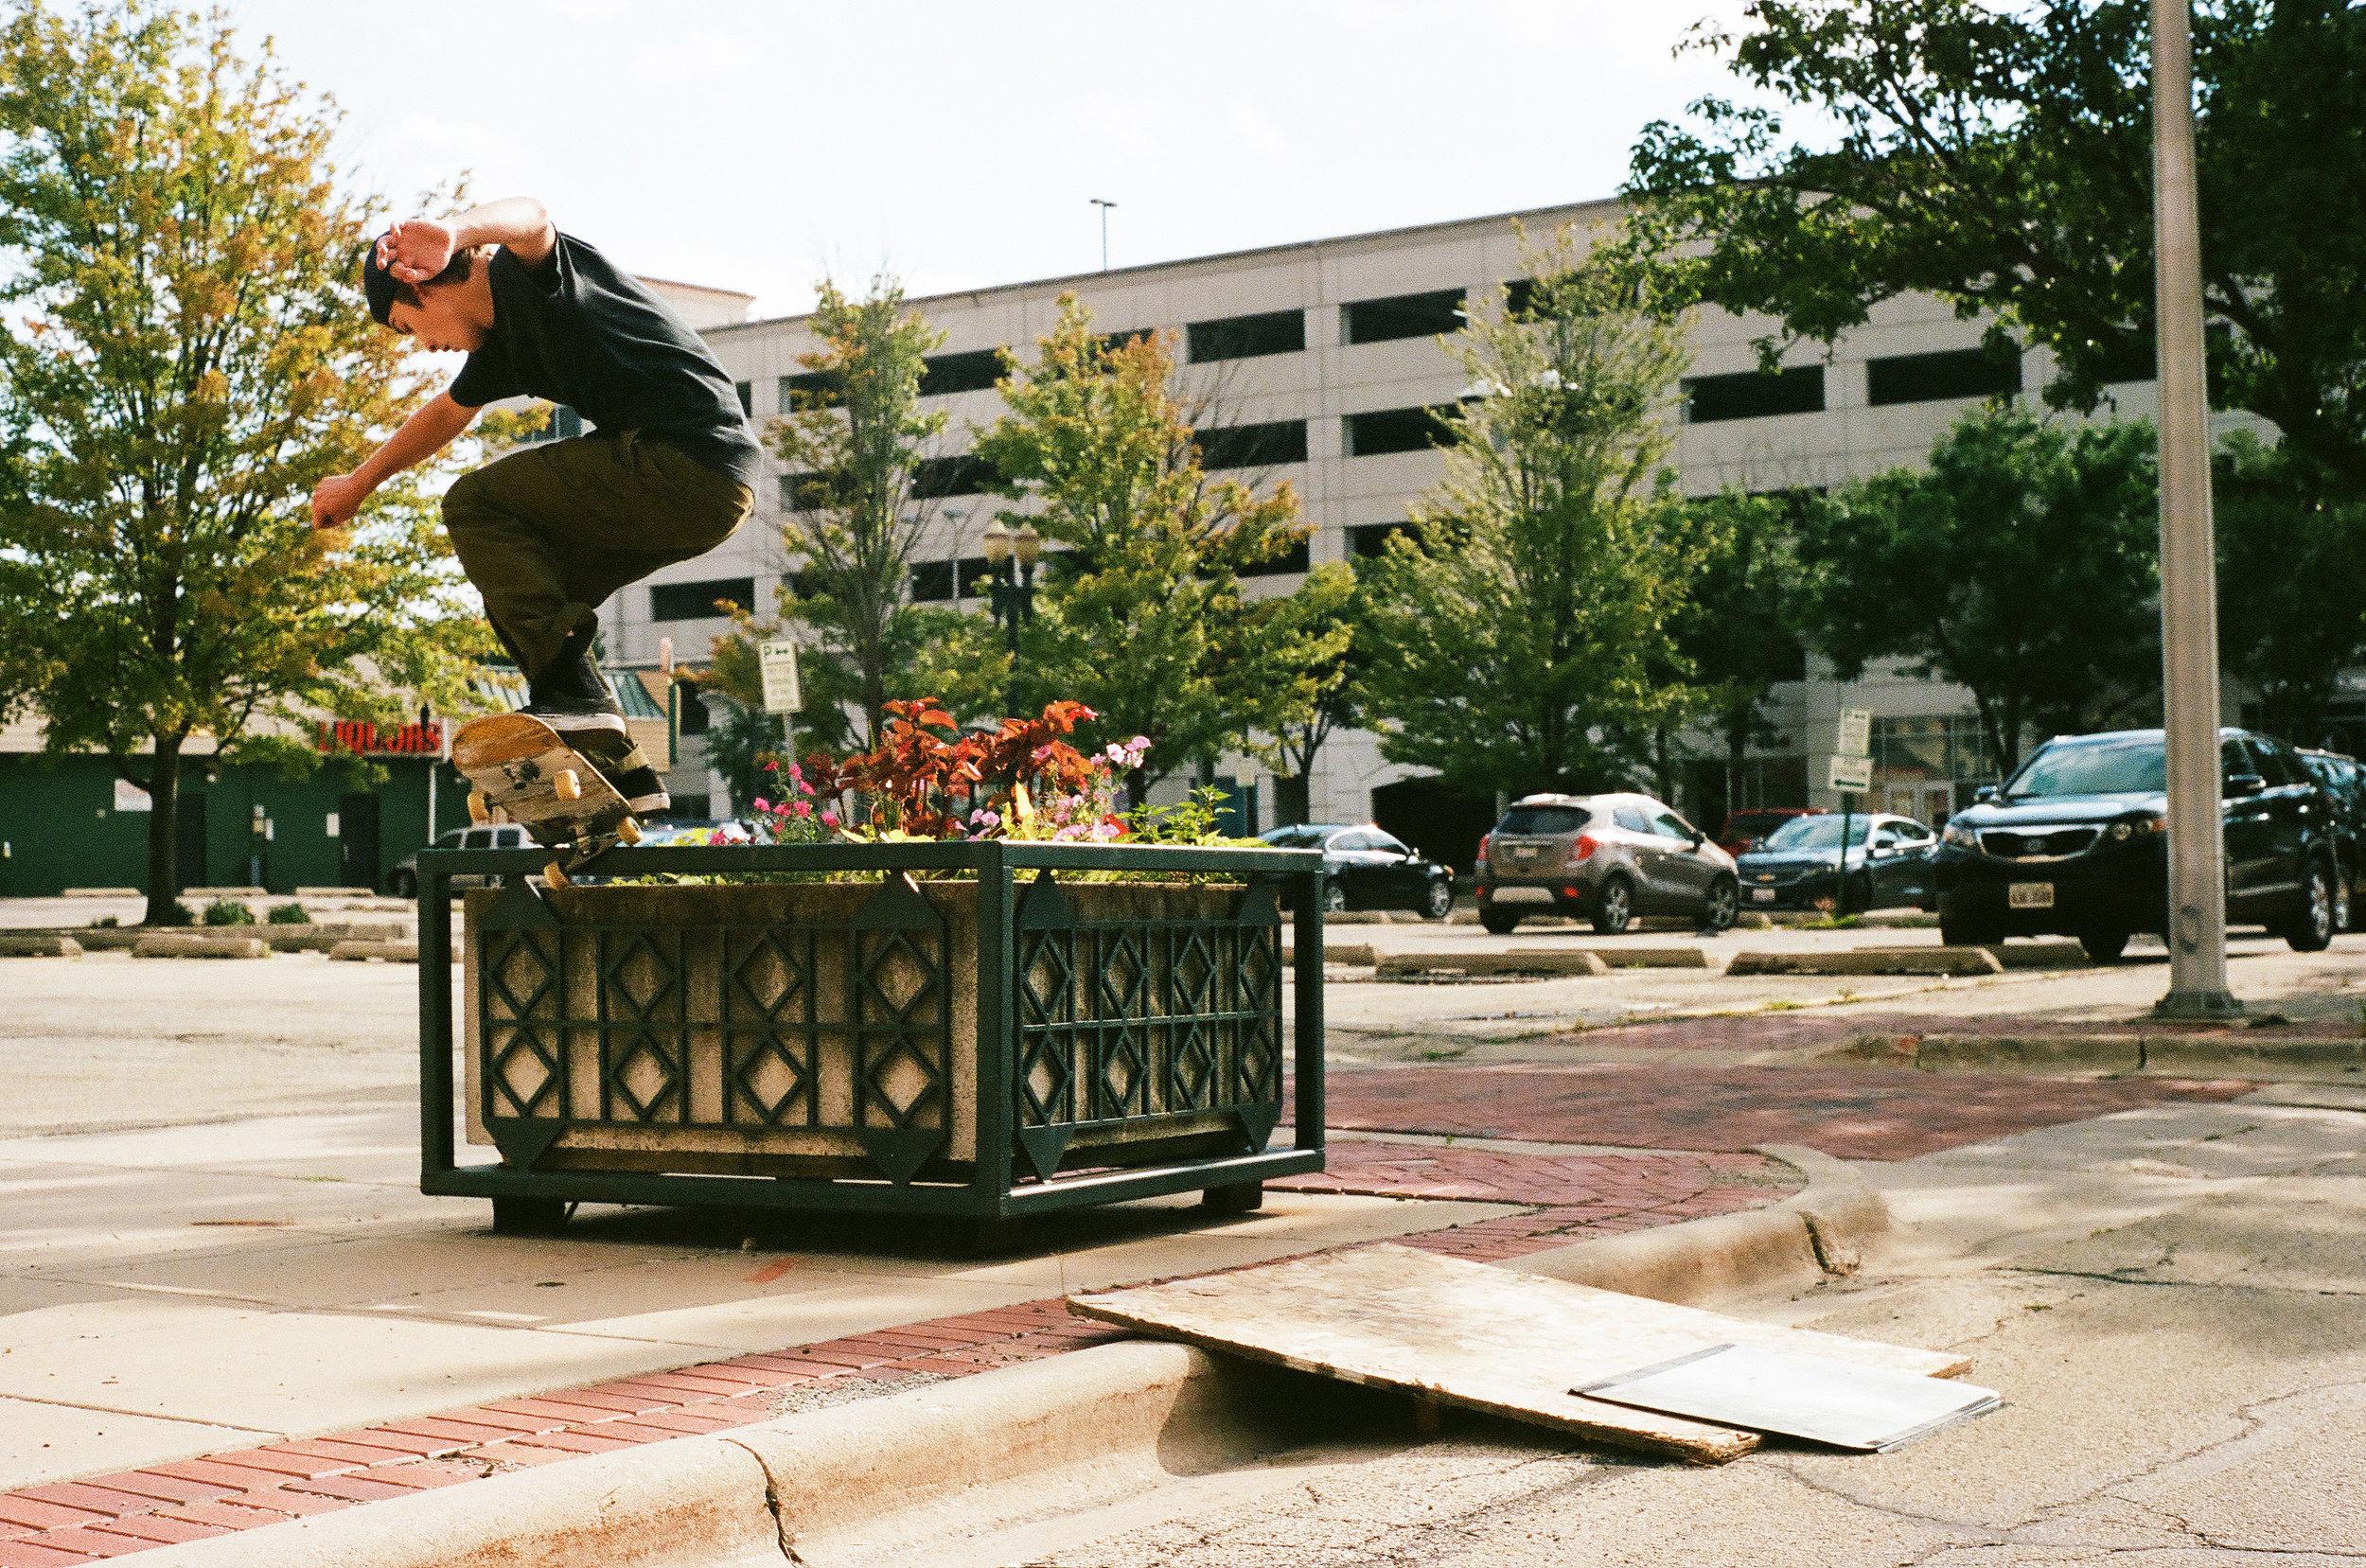 RileyVaughn_Crook2_Joliet,IL.jpg